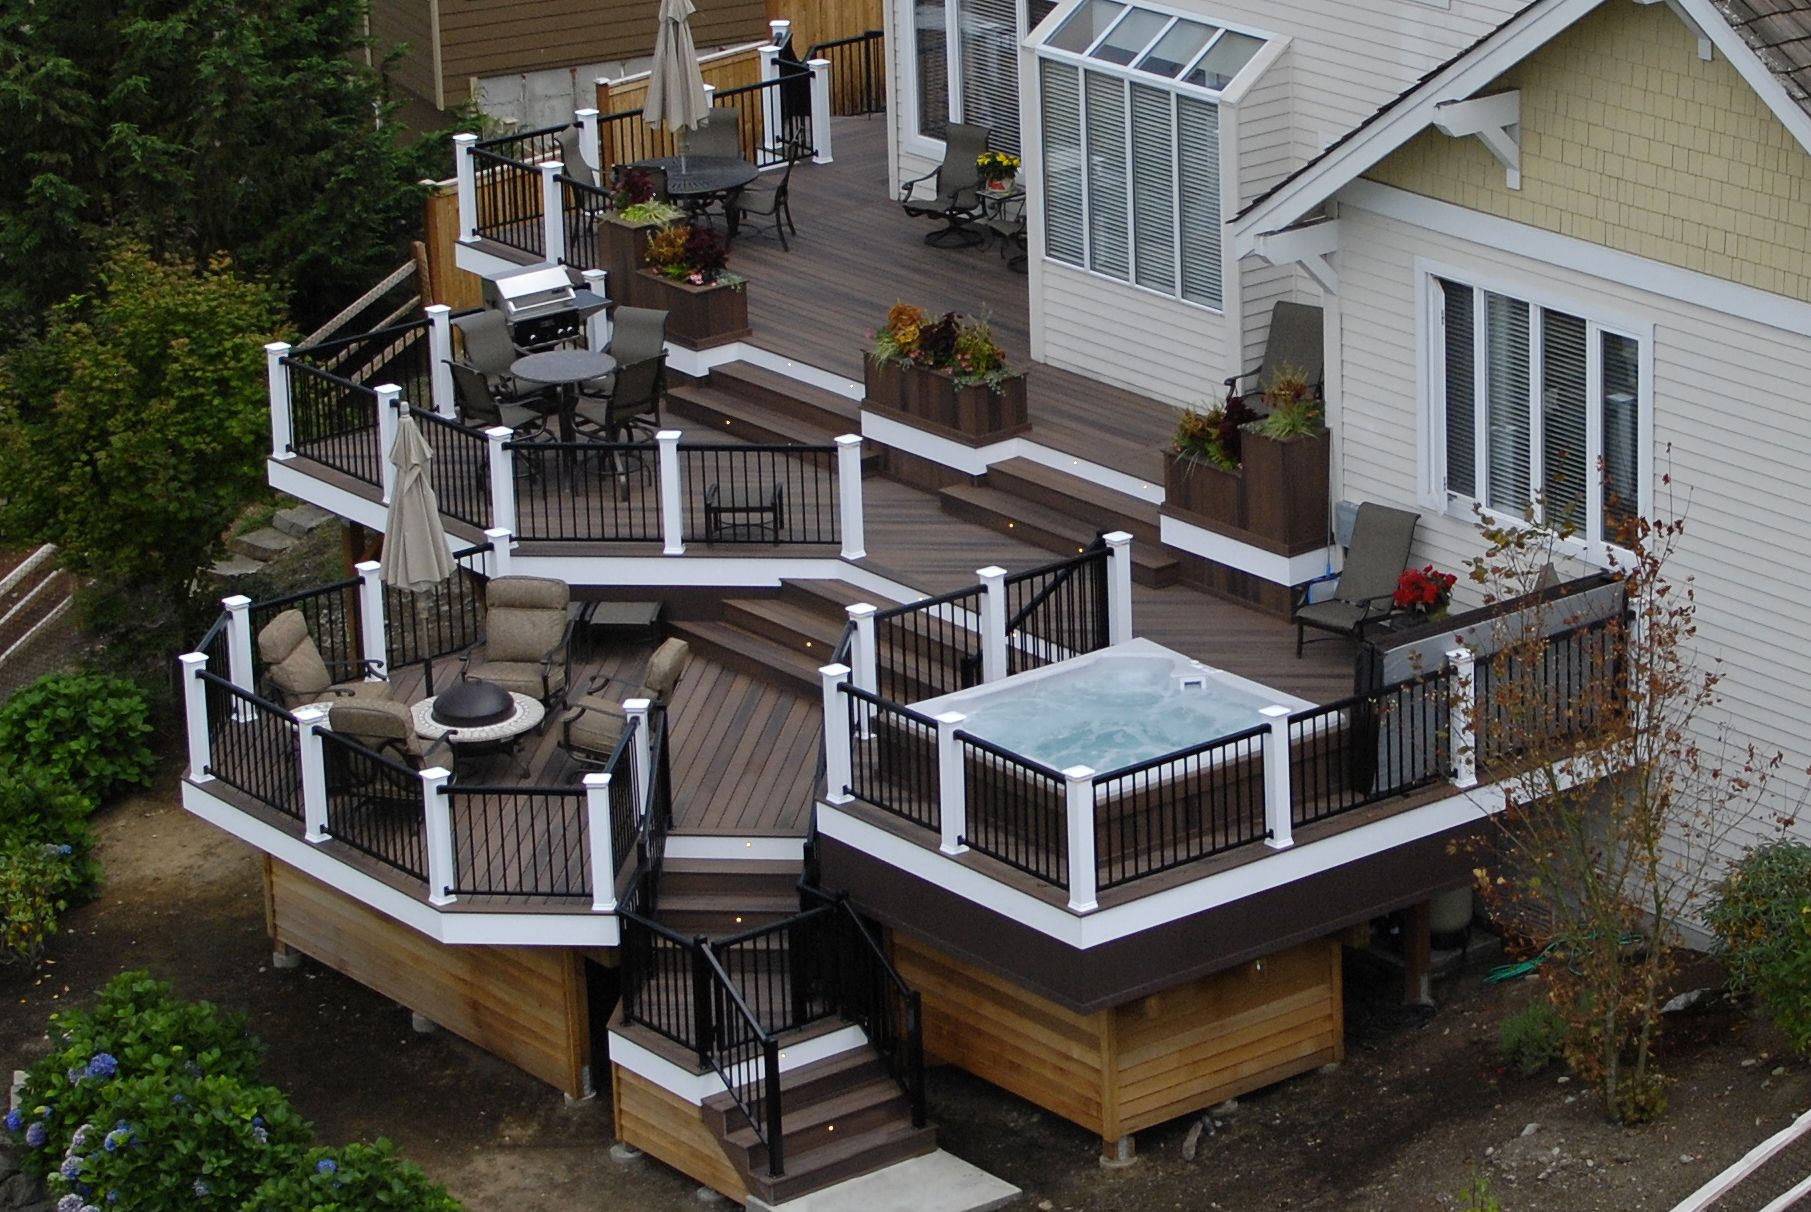 Custom Deck Design Construction Seattle Washington Deck Designs Backyard Patio Deck Designs Deck Design